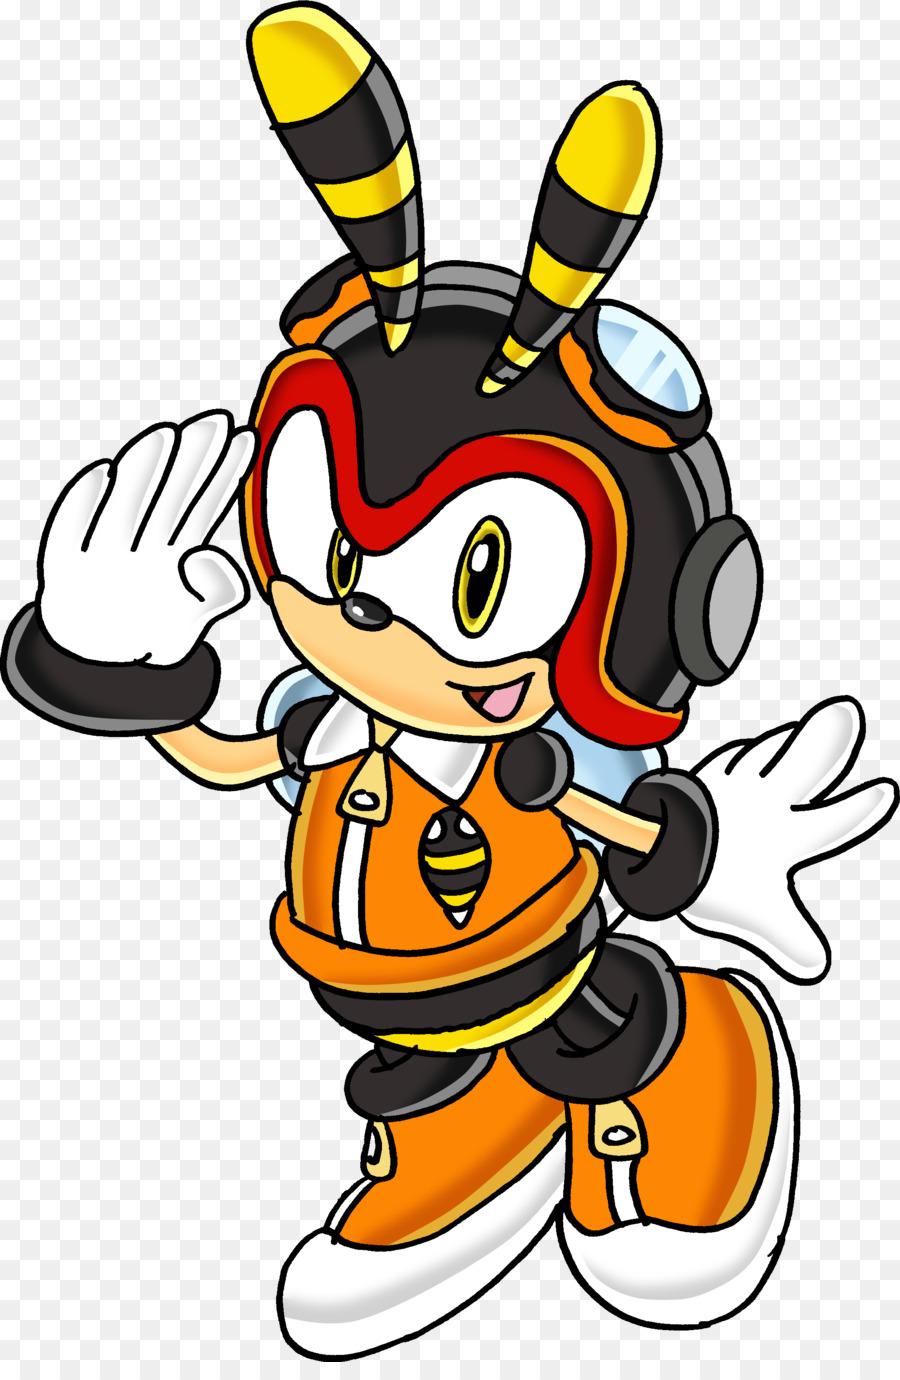 Charmy Bee Espio The Chameleon Vector The Crocodile Sonic